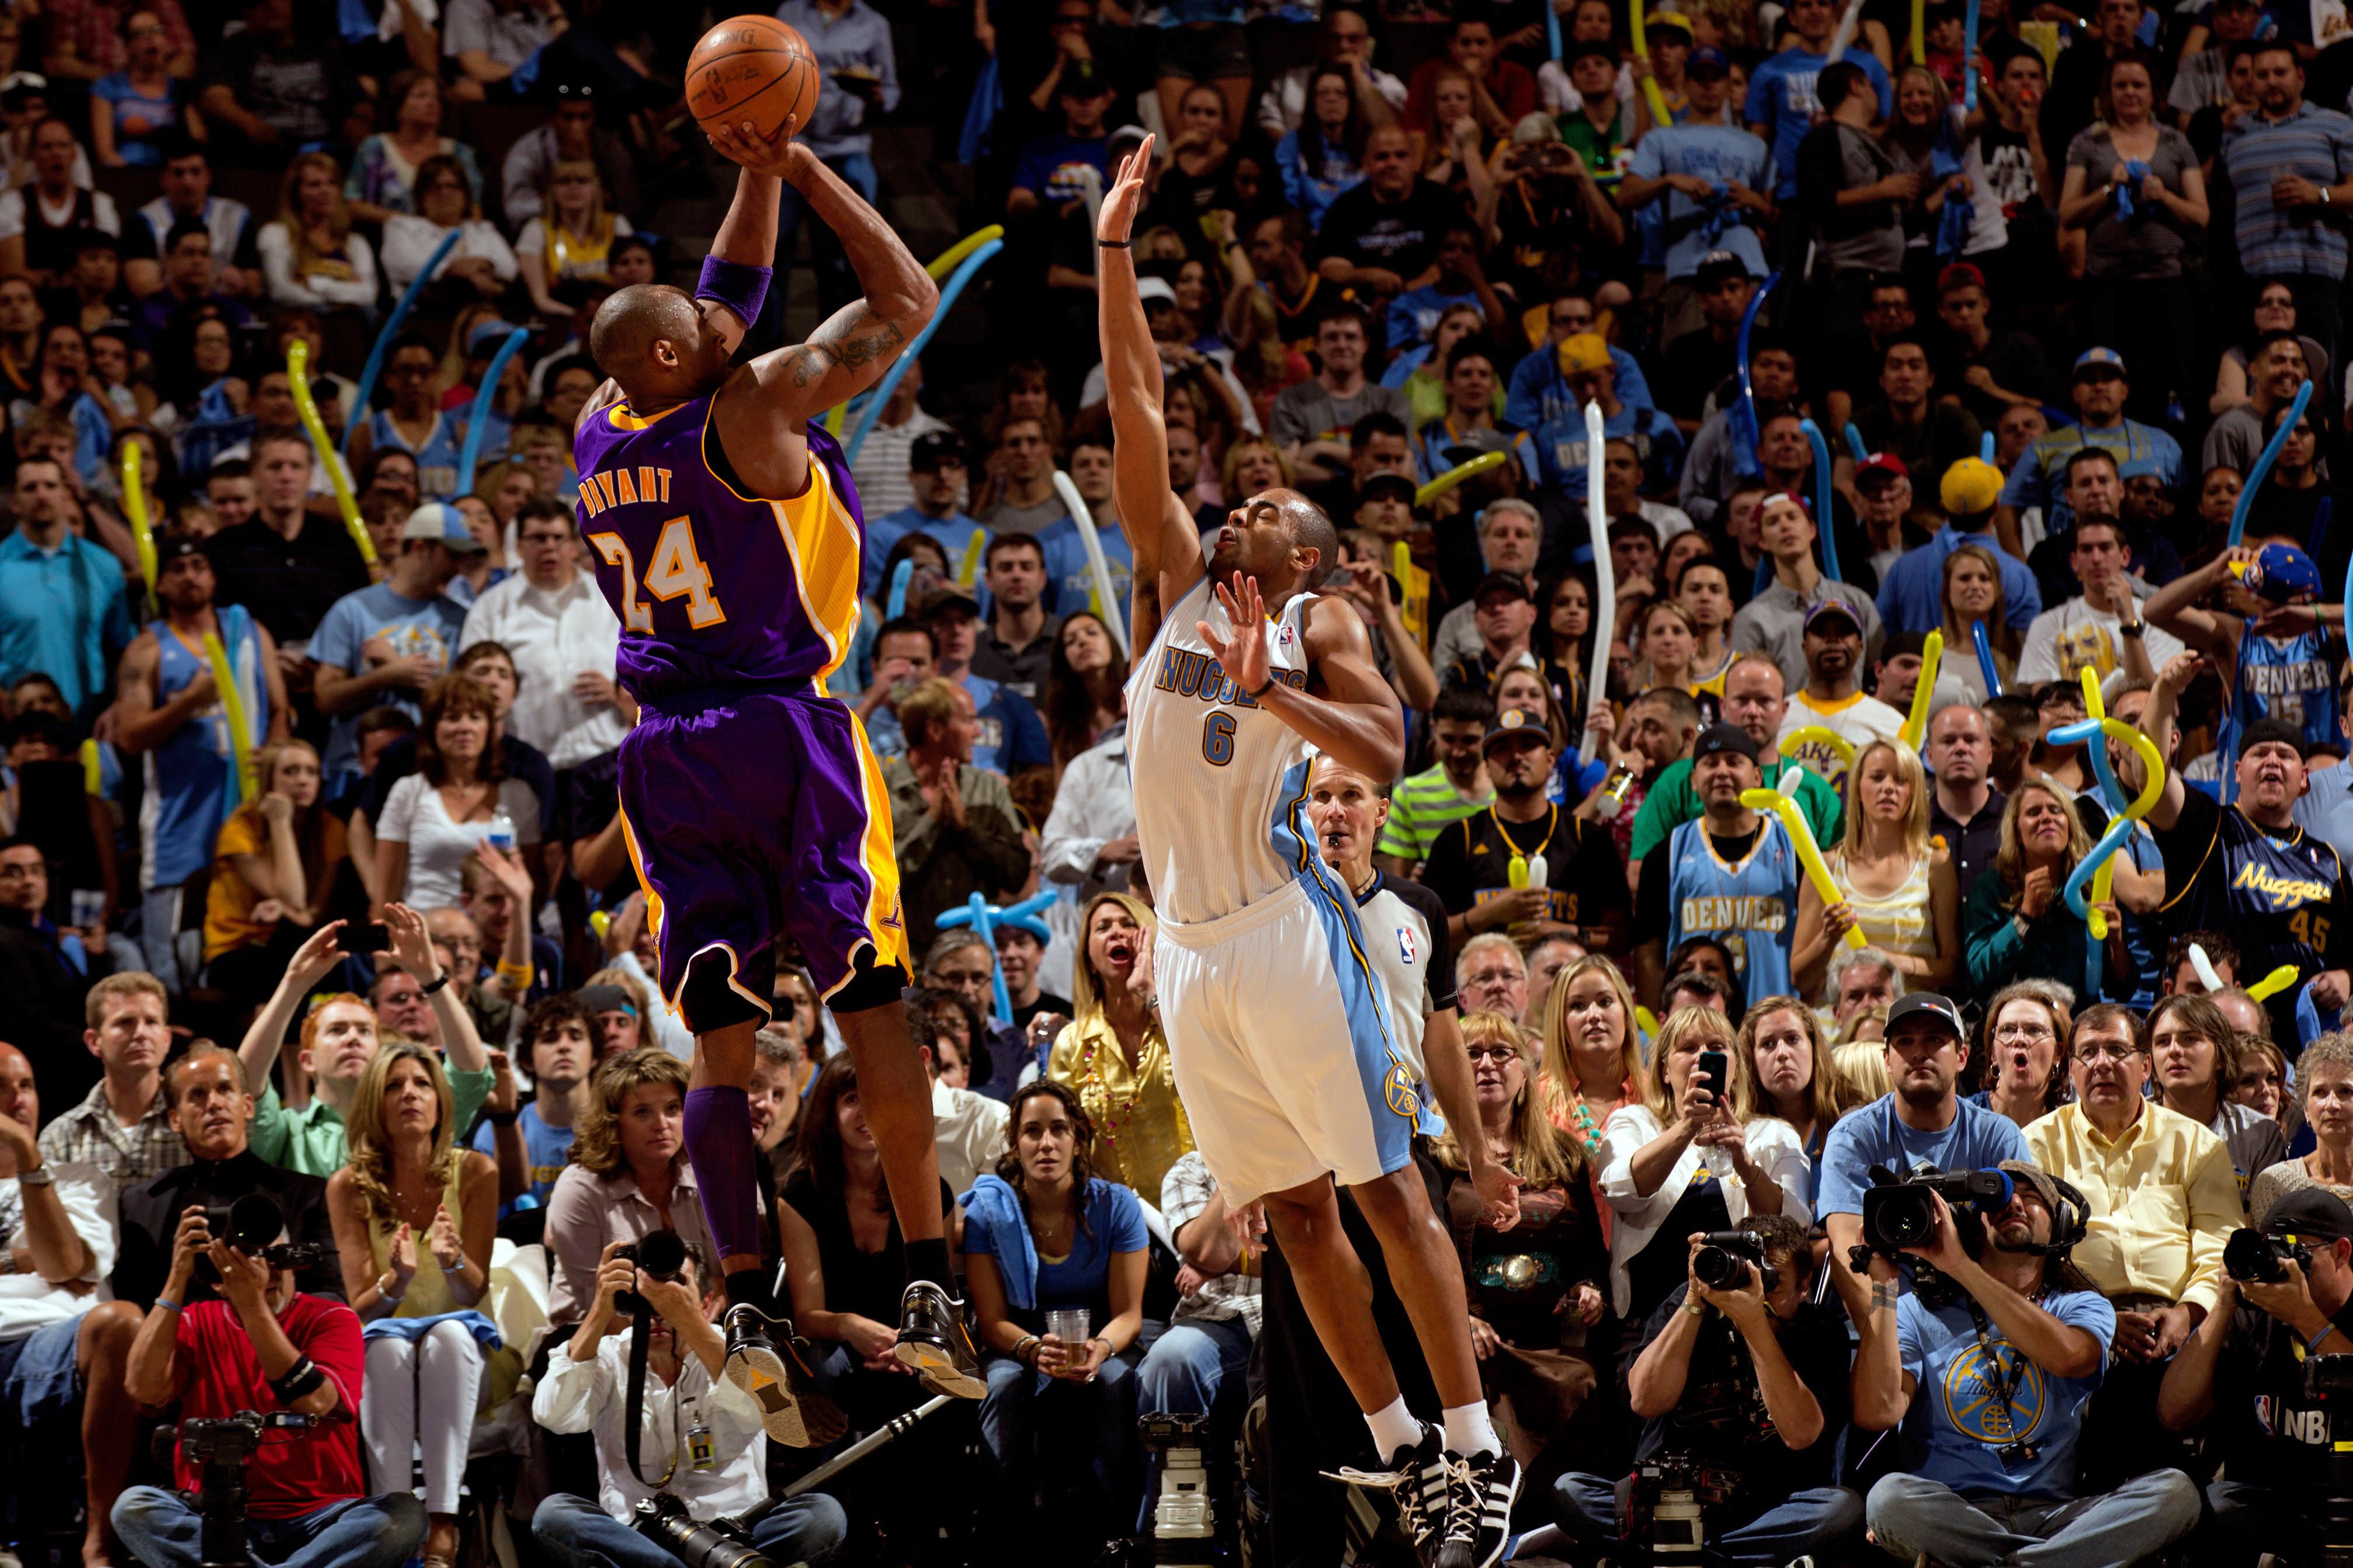 Nba Finals Average Viewership | All Basketball Scores Info